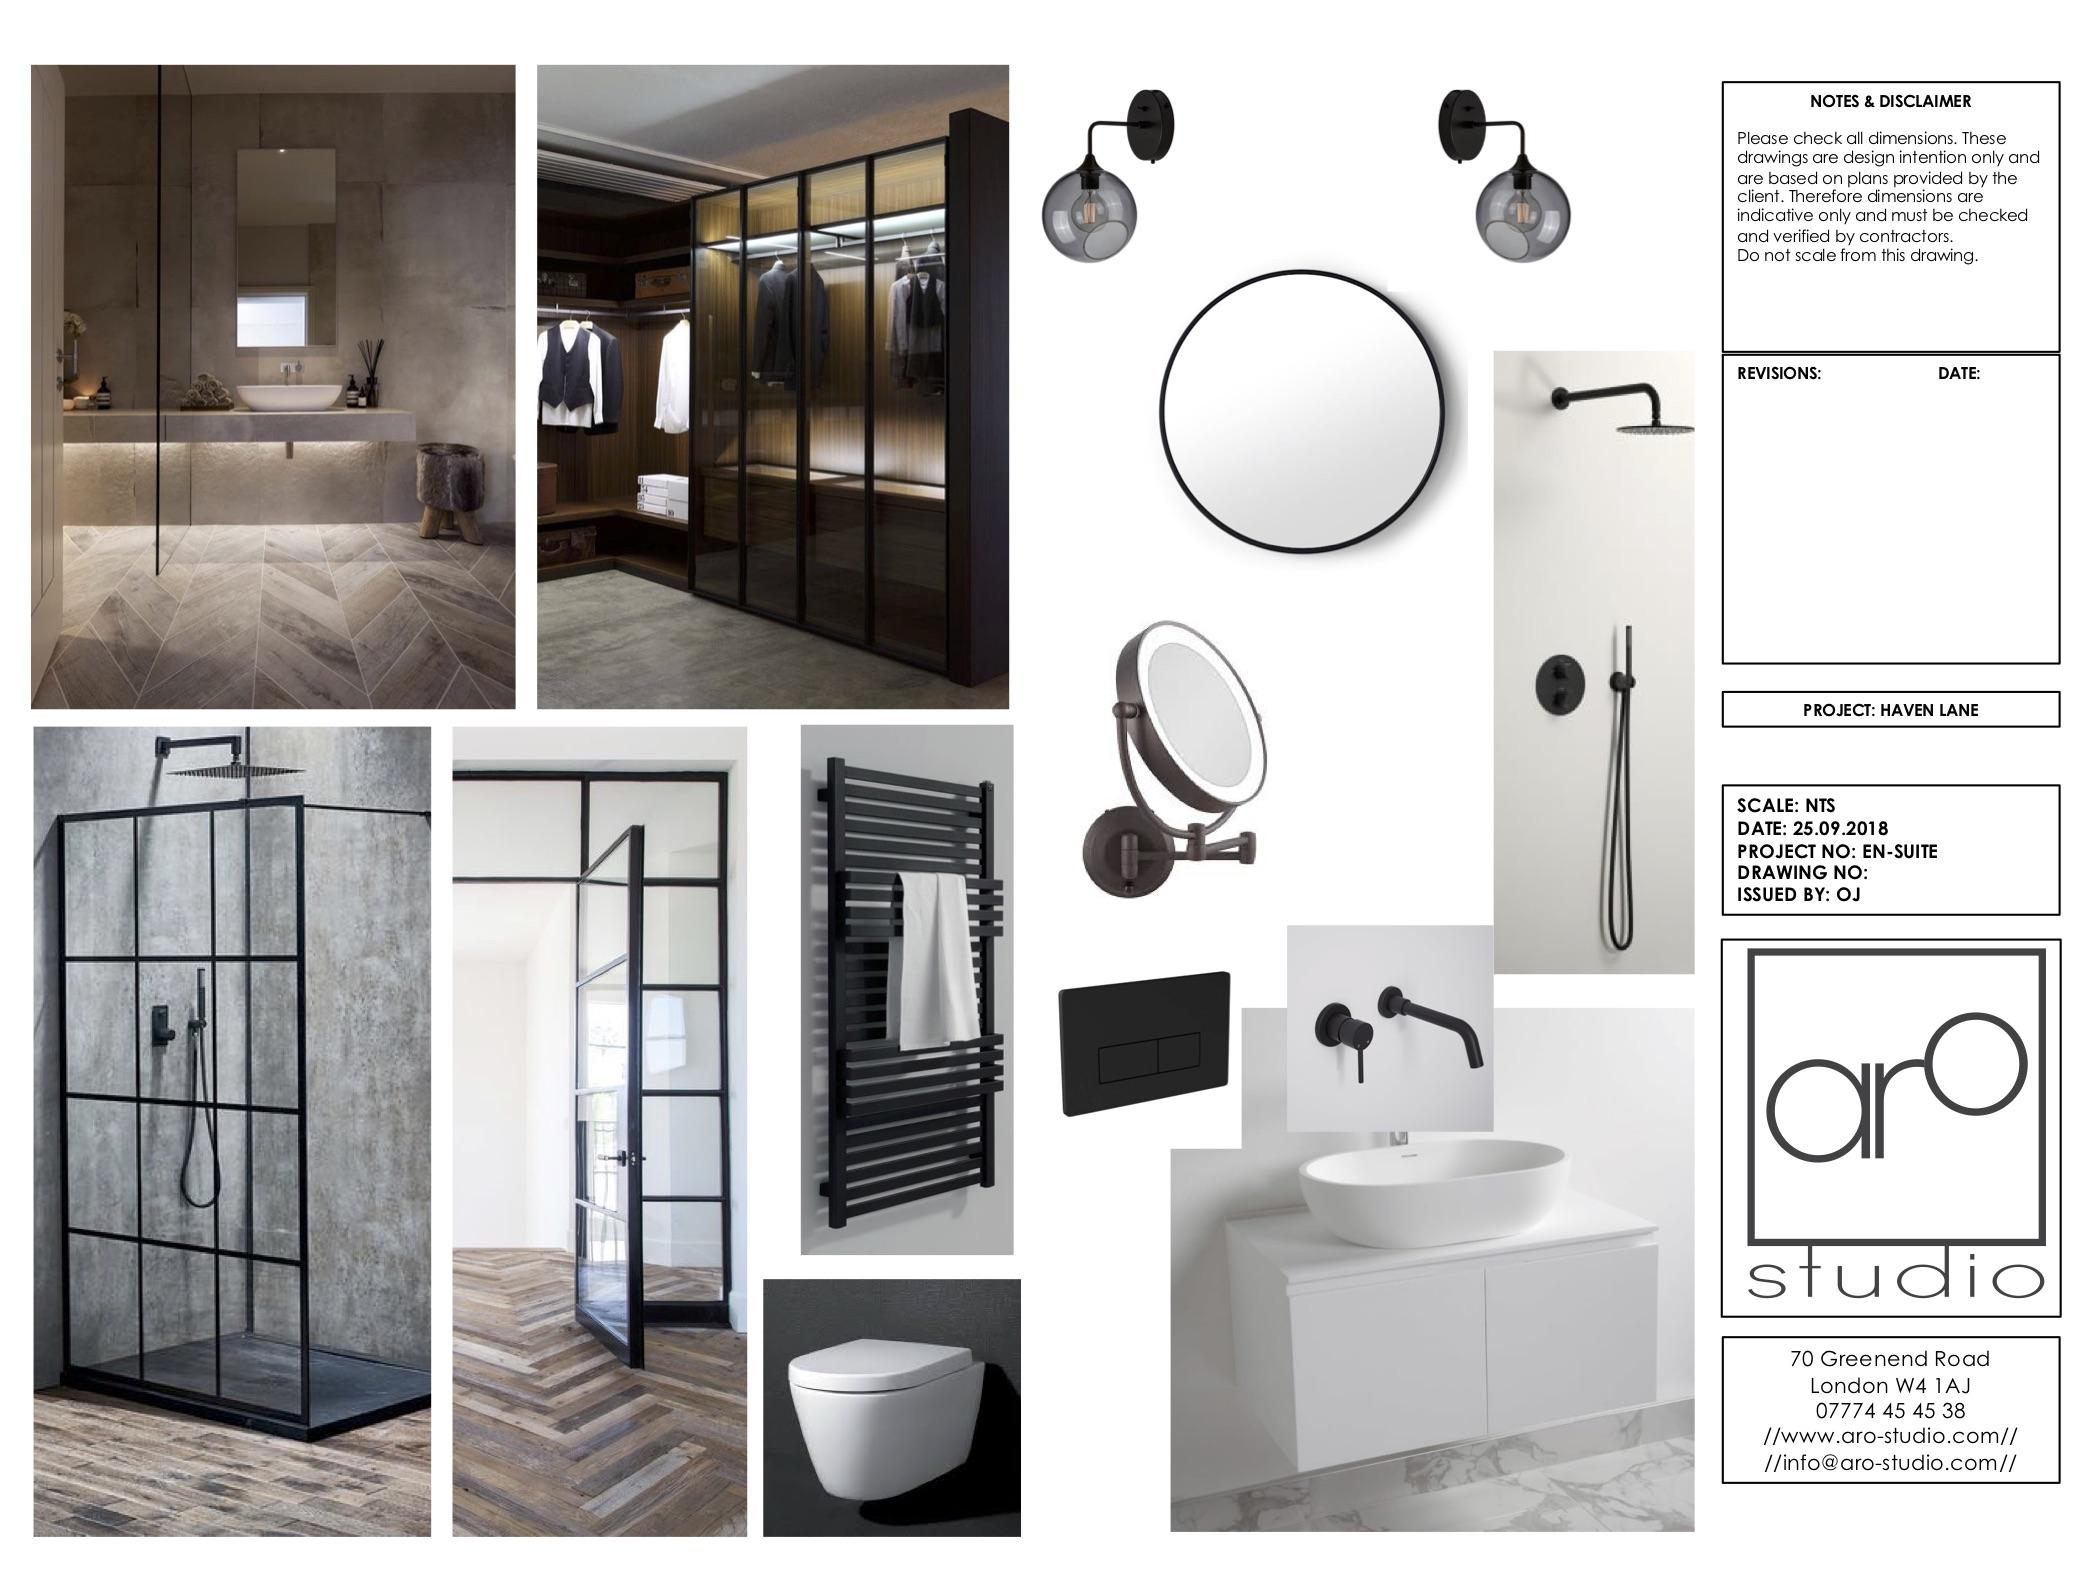 Family Home W5 - Portfolio - Aro Studio - Interior Architecture